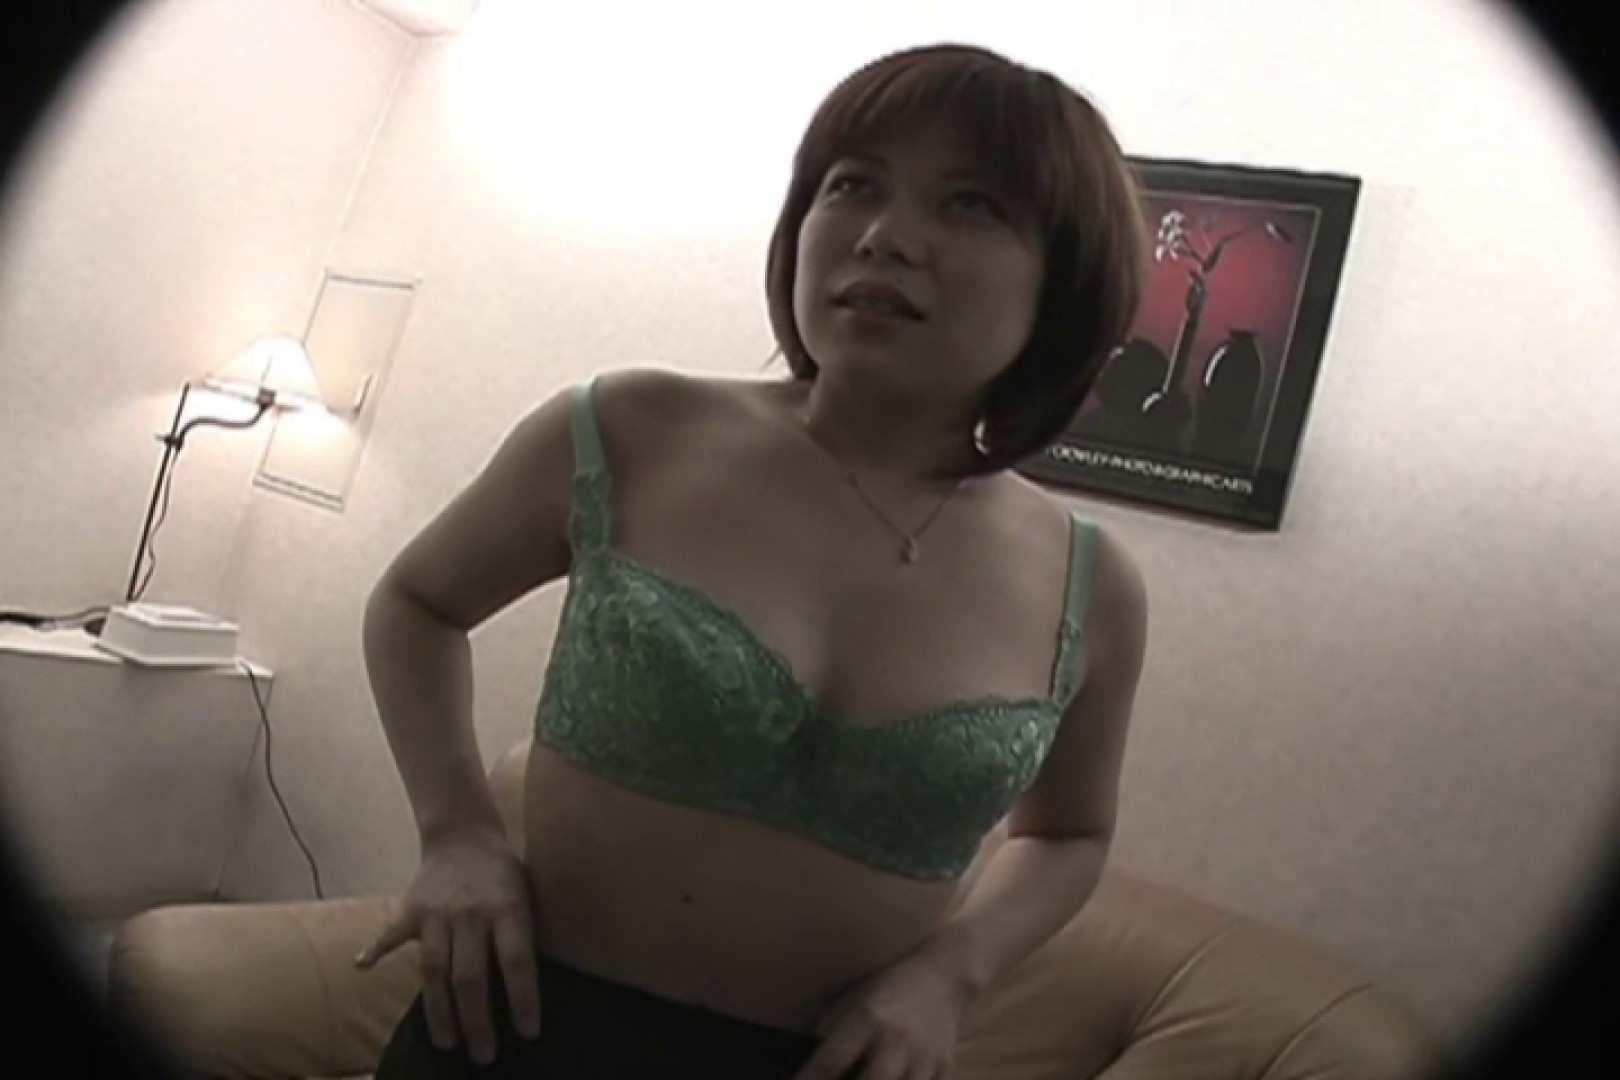 Hするために生まれてきたようなイキまくりの極エロ人妻~小池ゆり~ 熟女  108連発 52